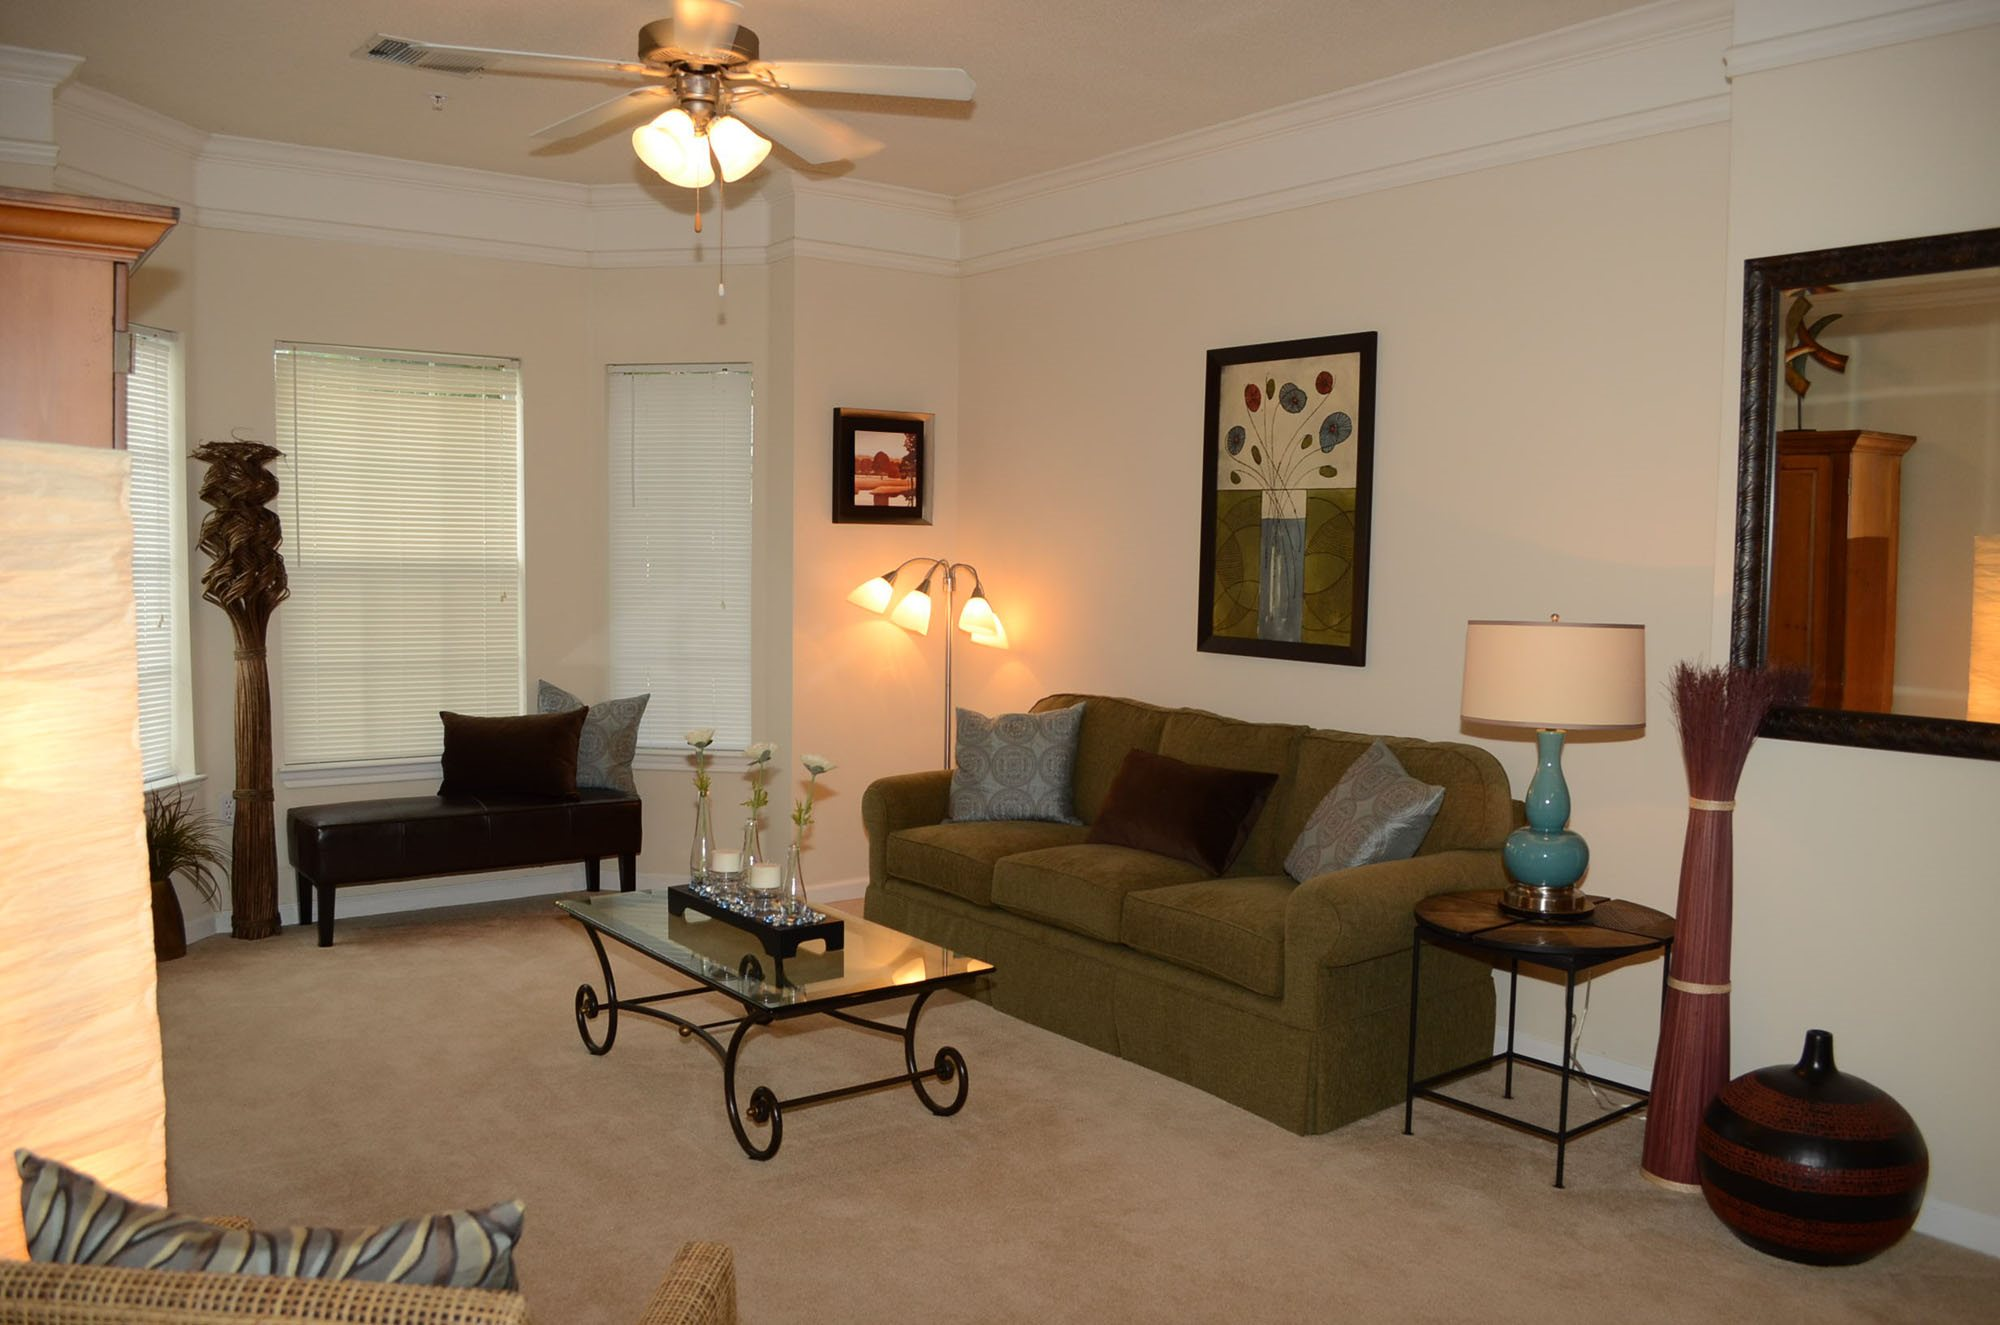 Waterford landing apartments in hermitage tn 37076 for 3 bedroom apartments in hermitage tn